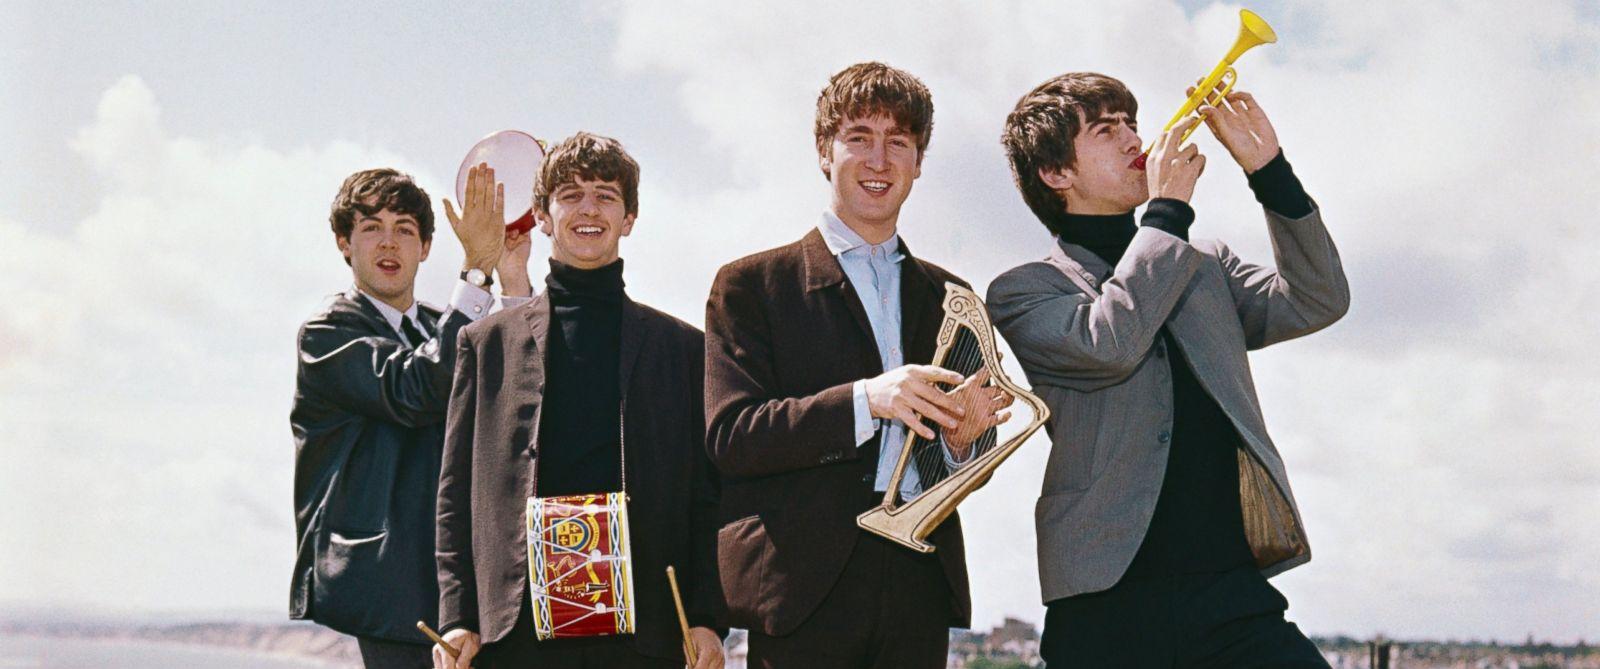 PHOTO: Paul McCartney, Ringo Starr, John Lennon and George Harrison in England in 1964.